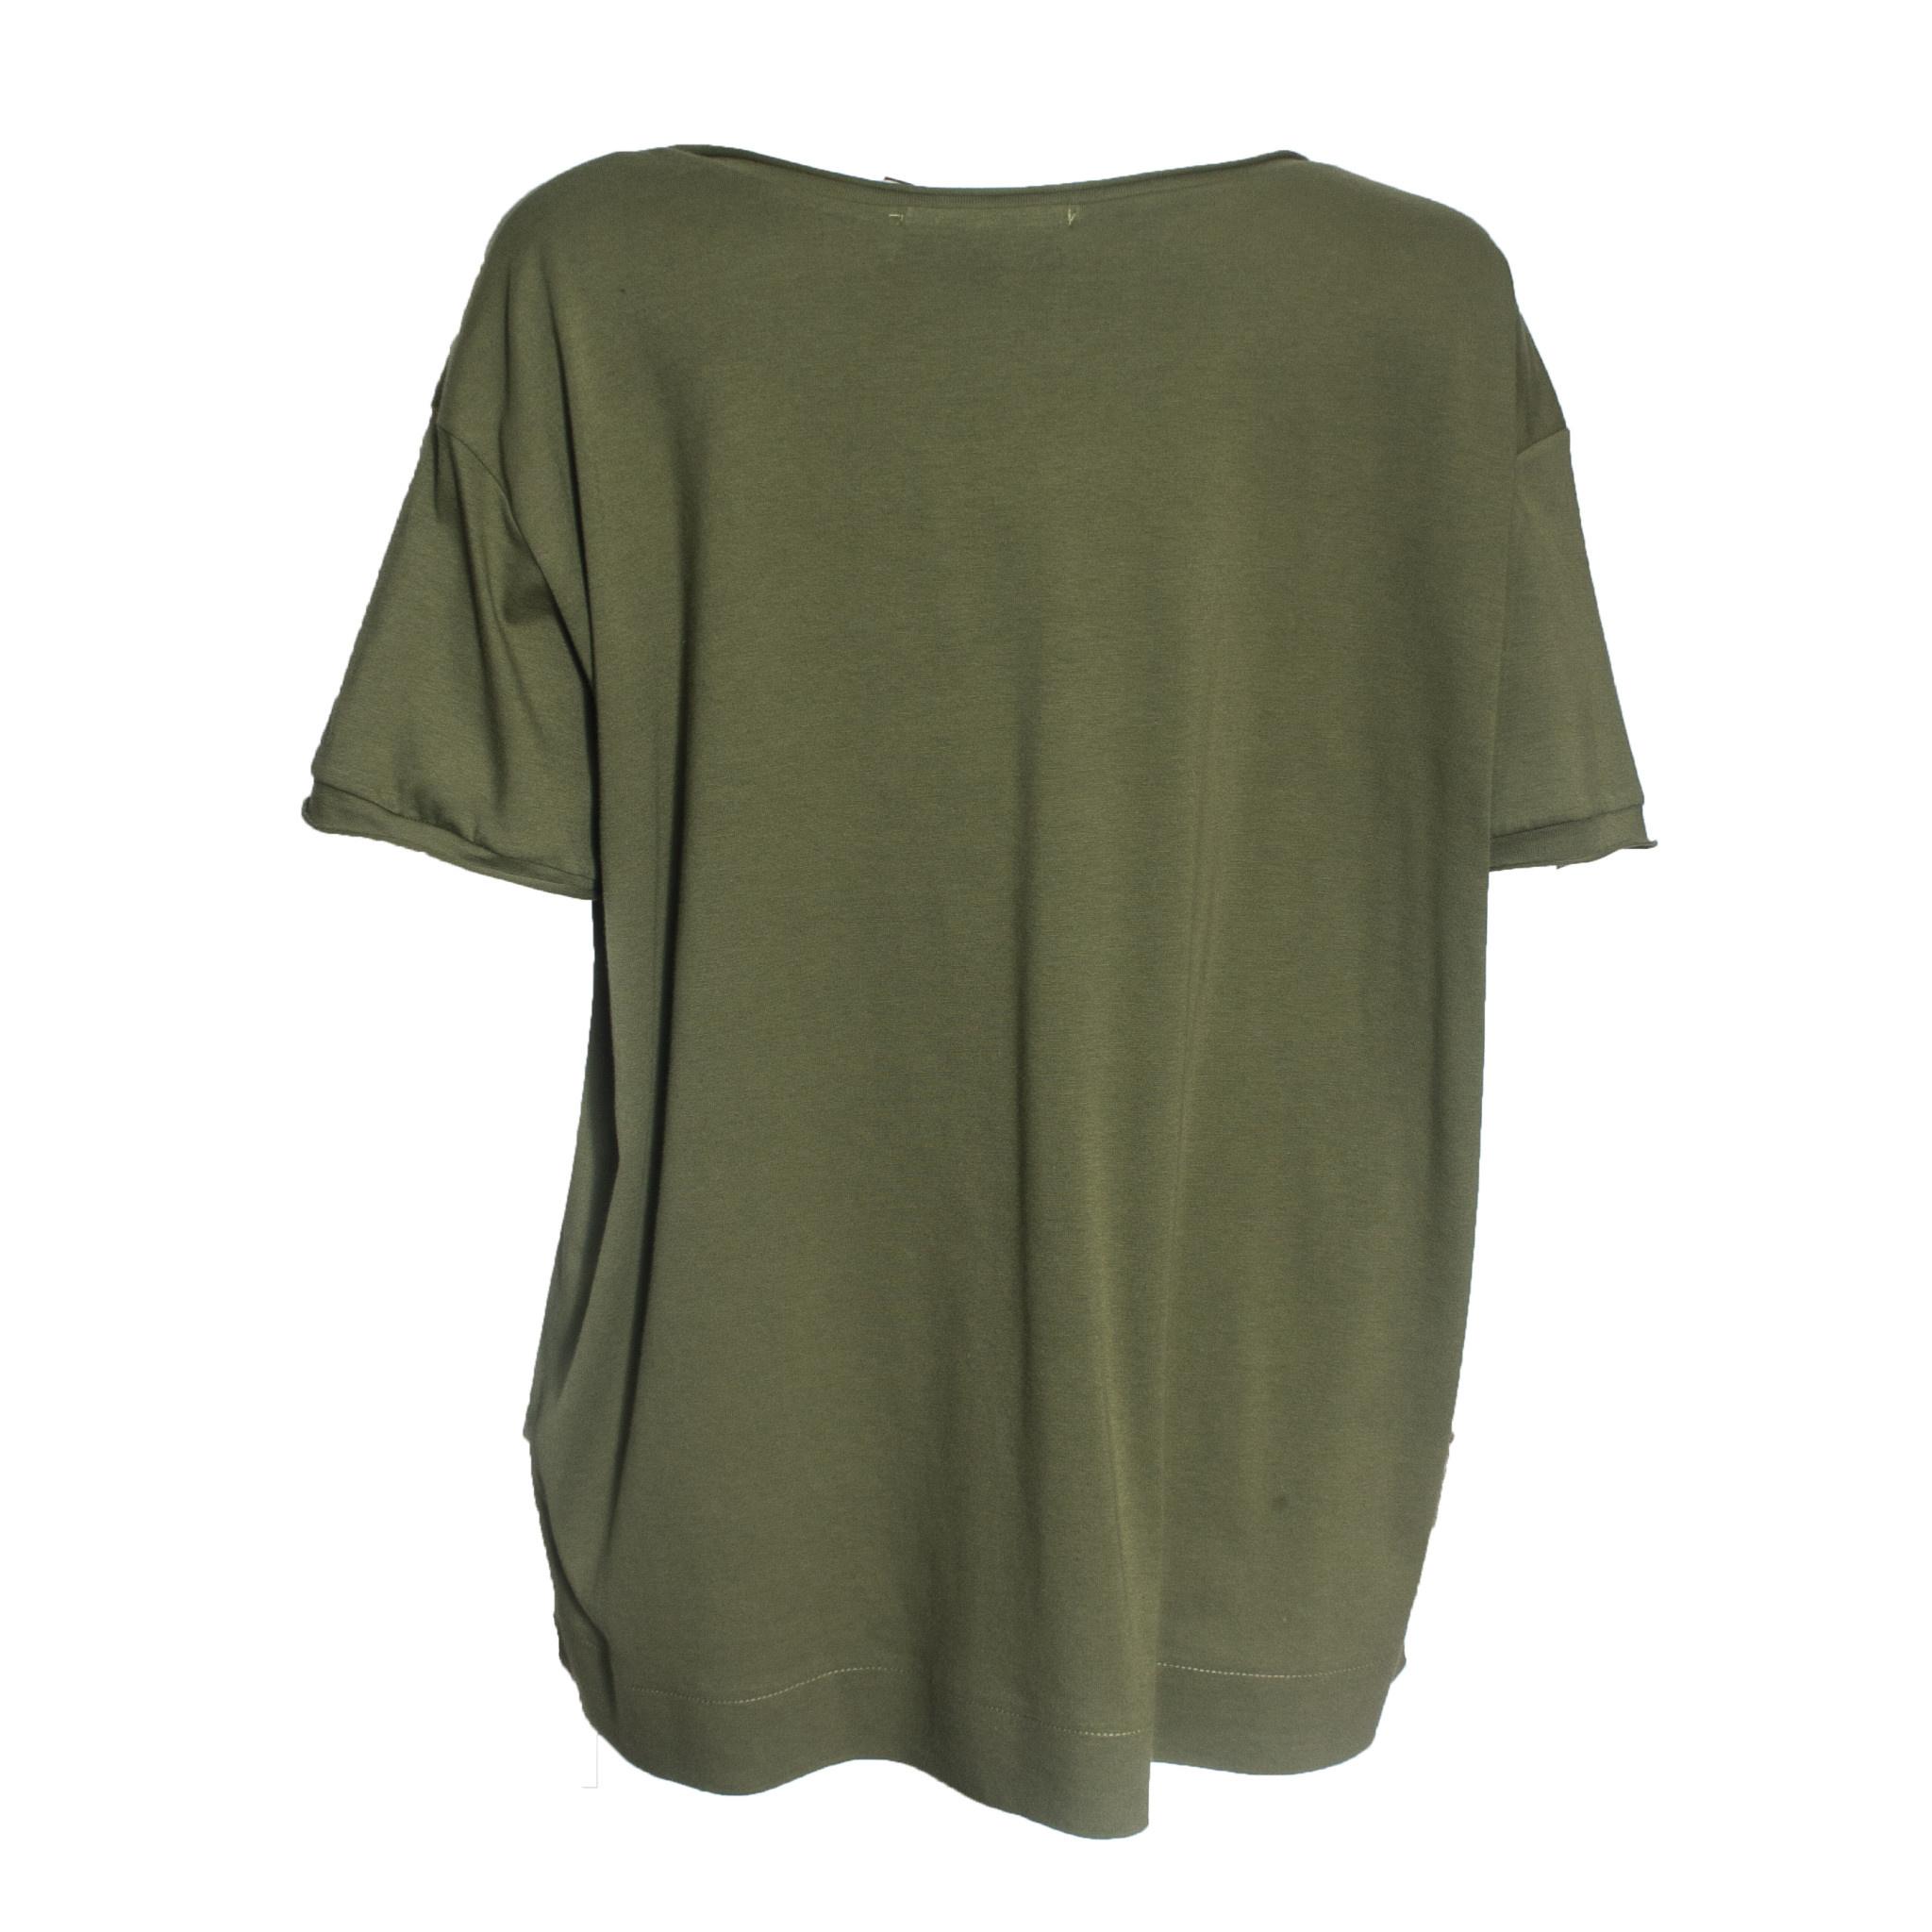 Kedziorek Kedziorek Short Sleeve Tee - Green